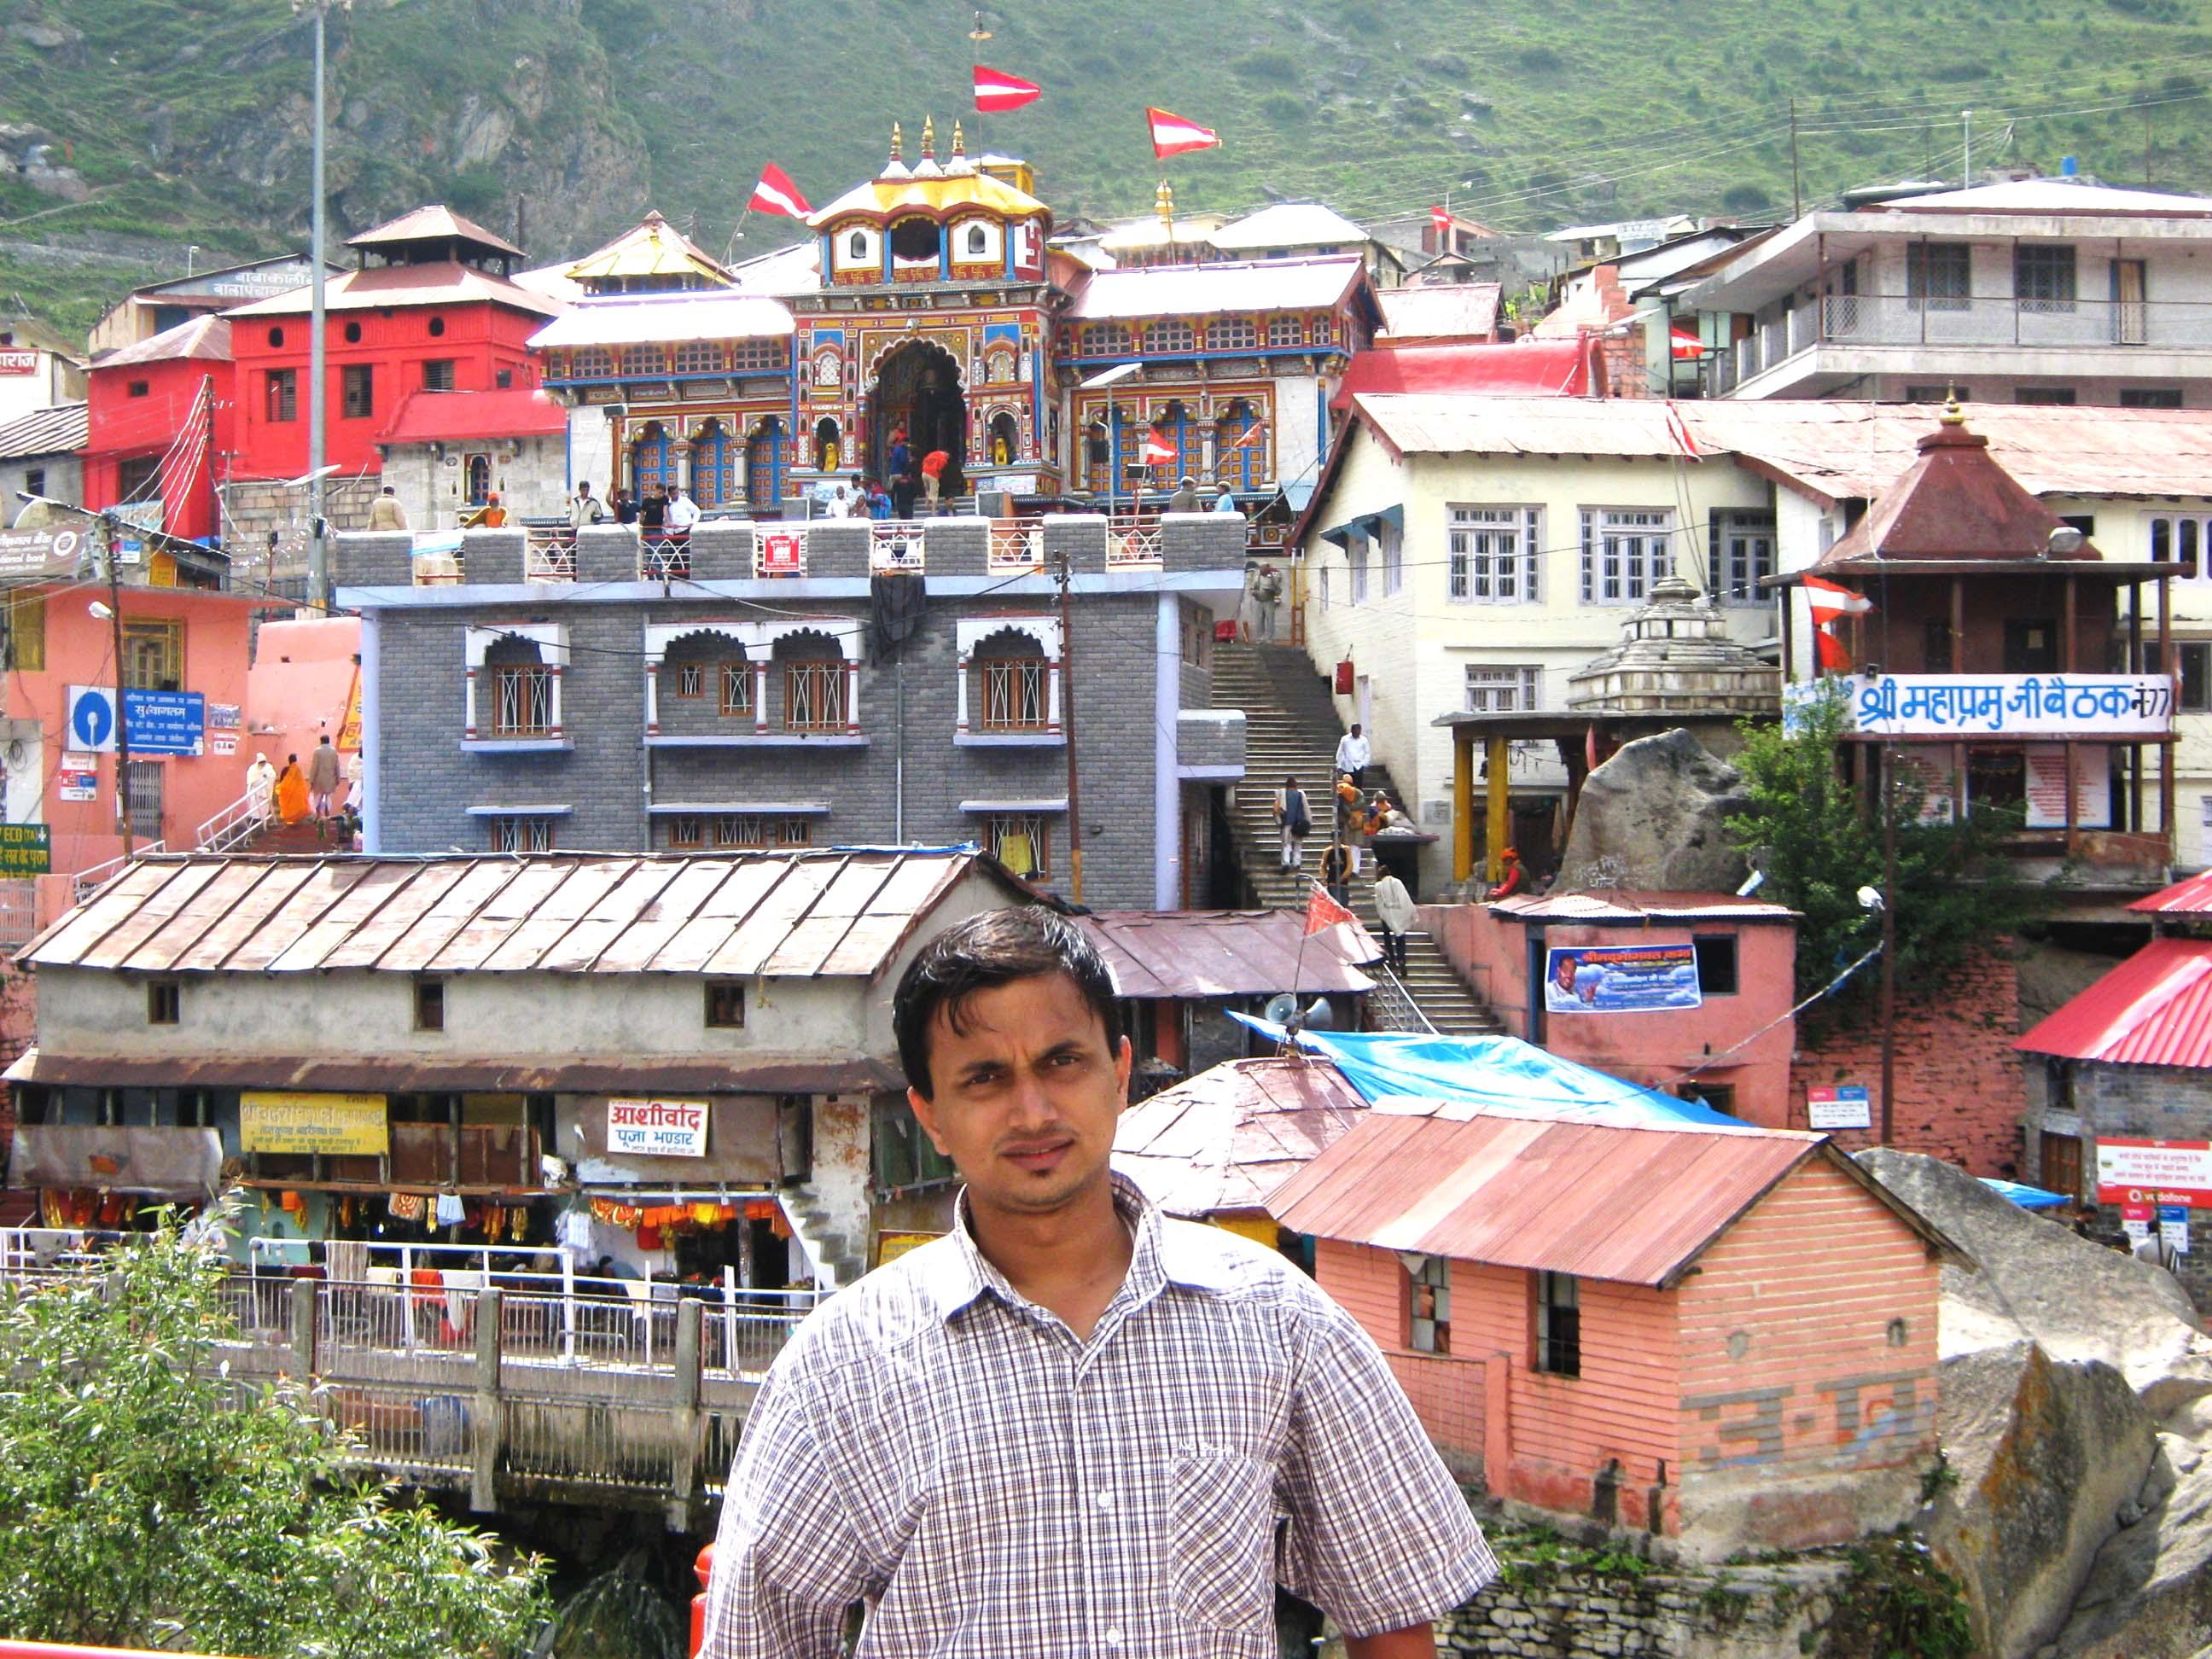 Incredible Kedarnath & Badrinath  Soumyajit's Blog